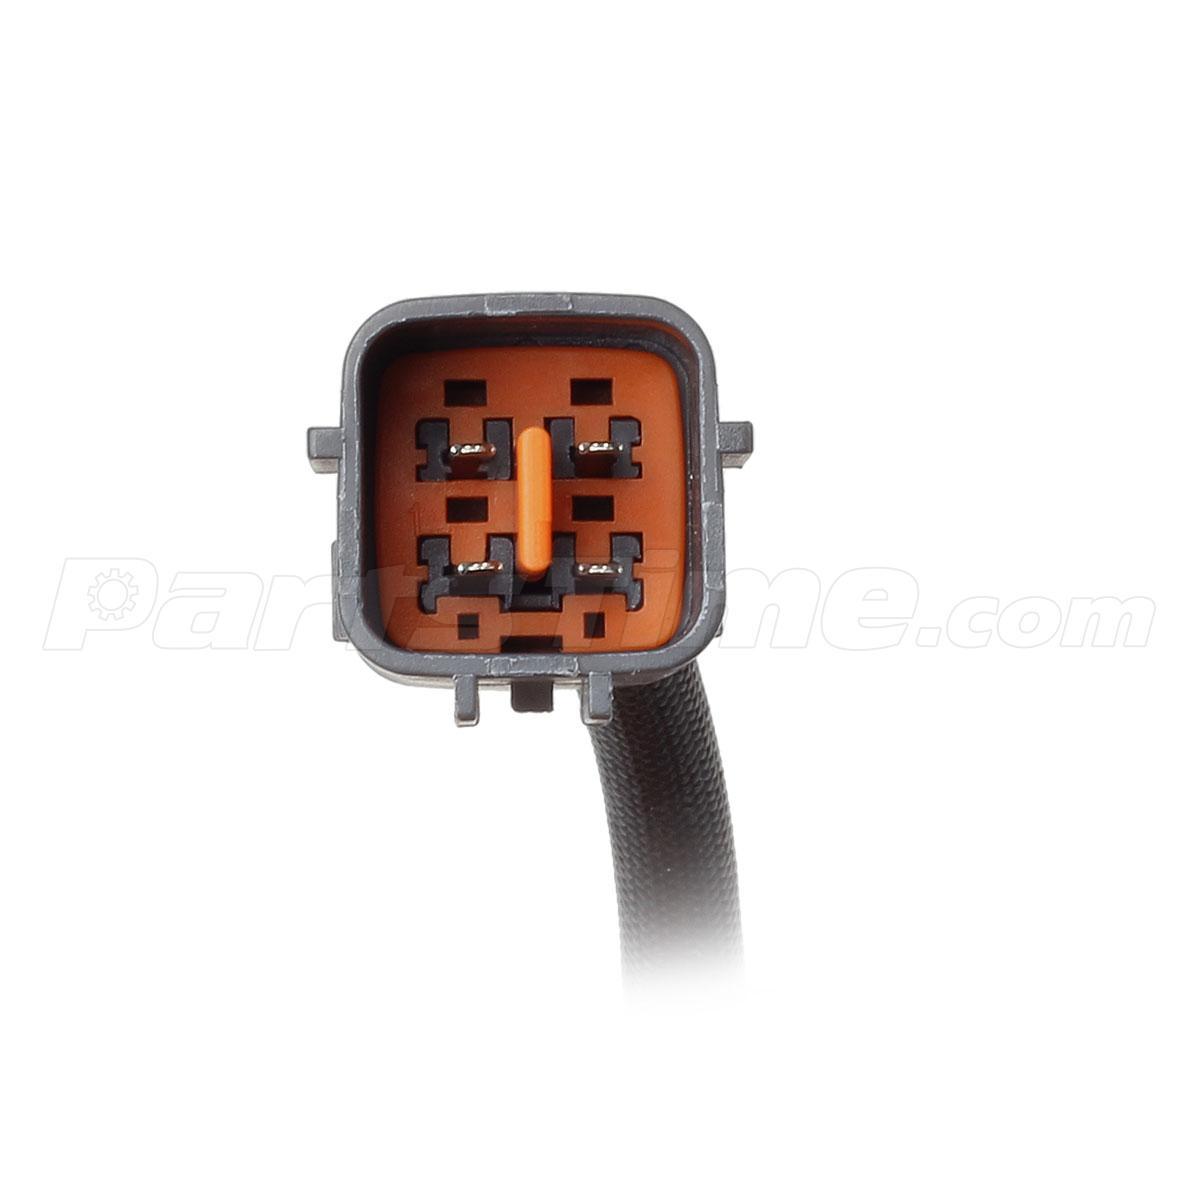 o2 sensor heater gm single wire alternator diagram 4pcs heated oxygen 1 2 bank for 2004 mazda 6